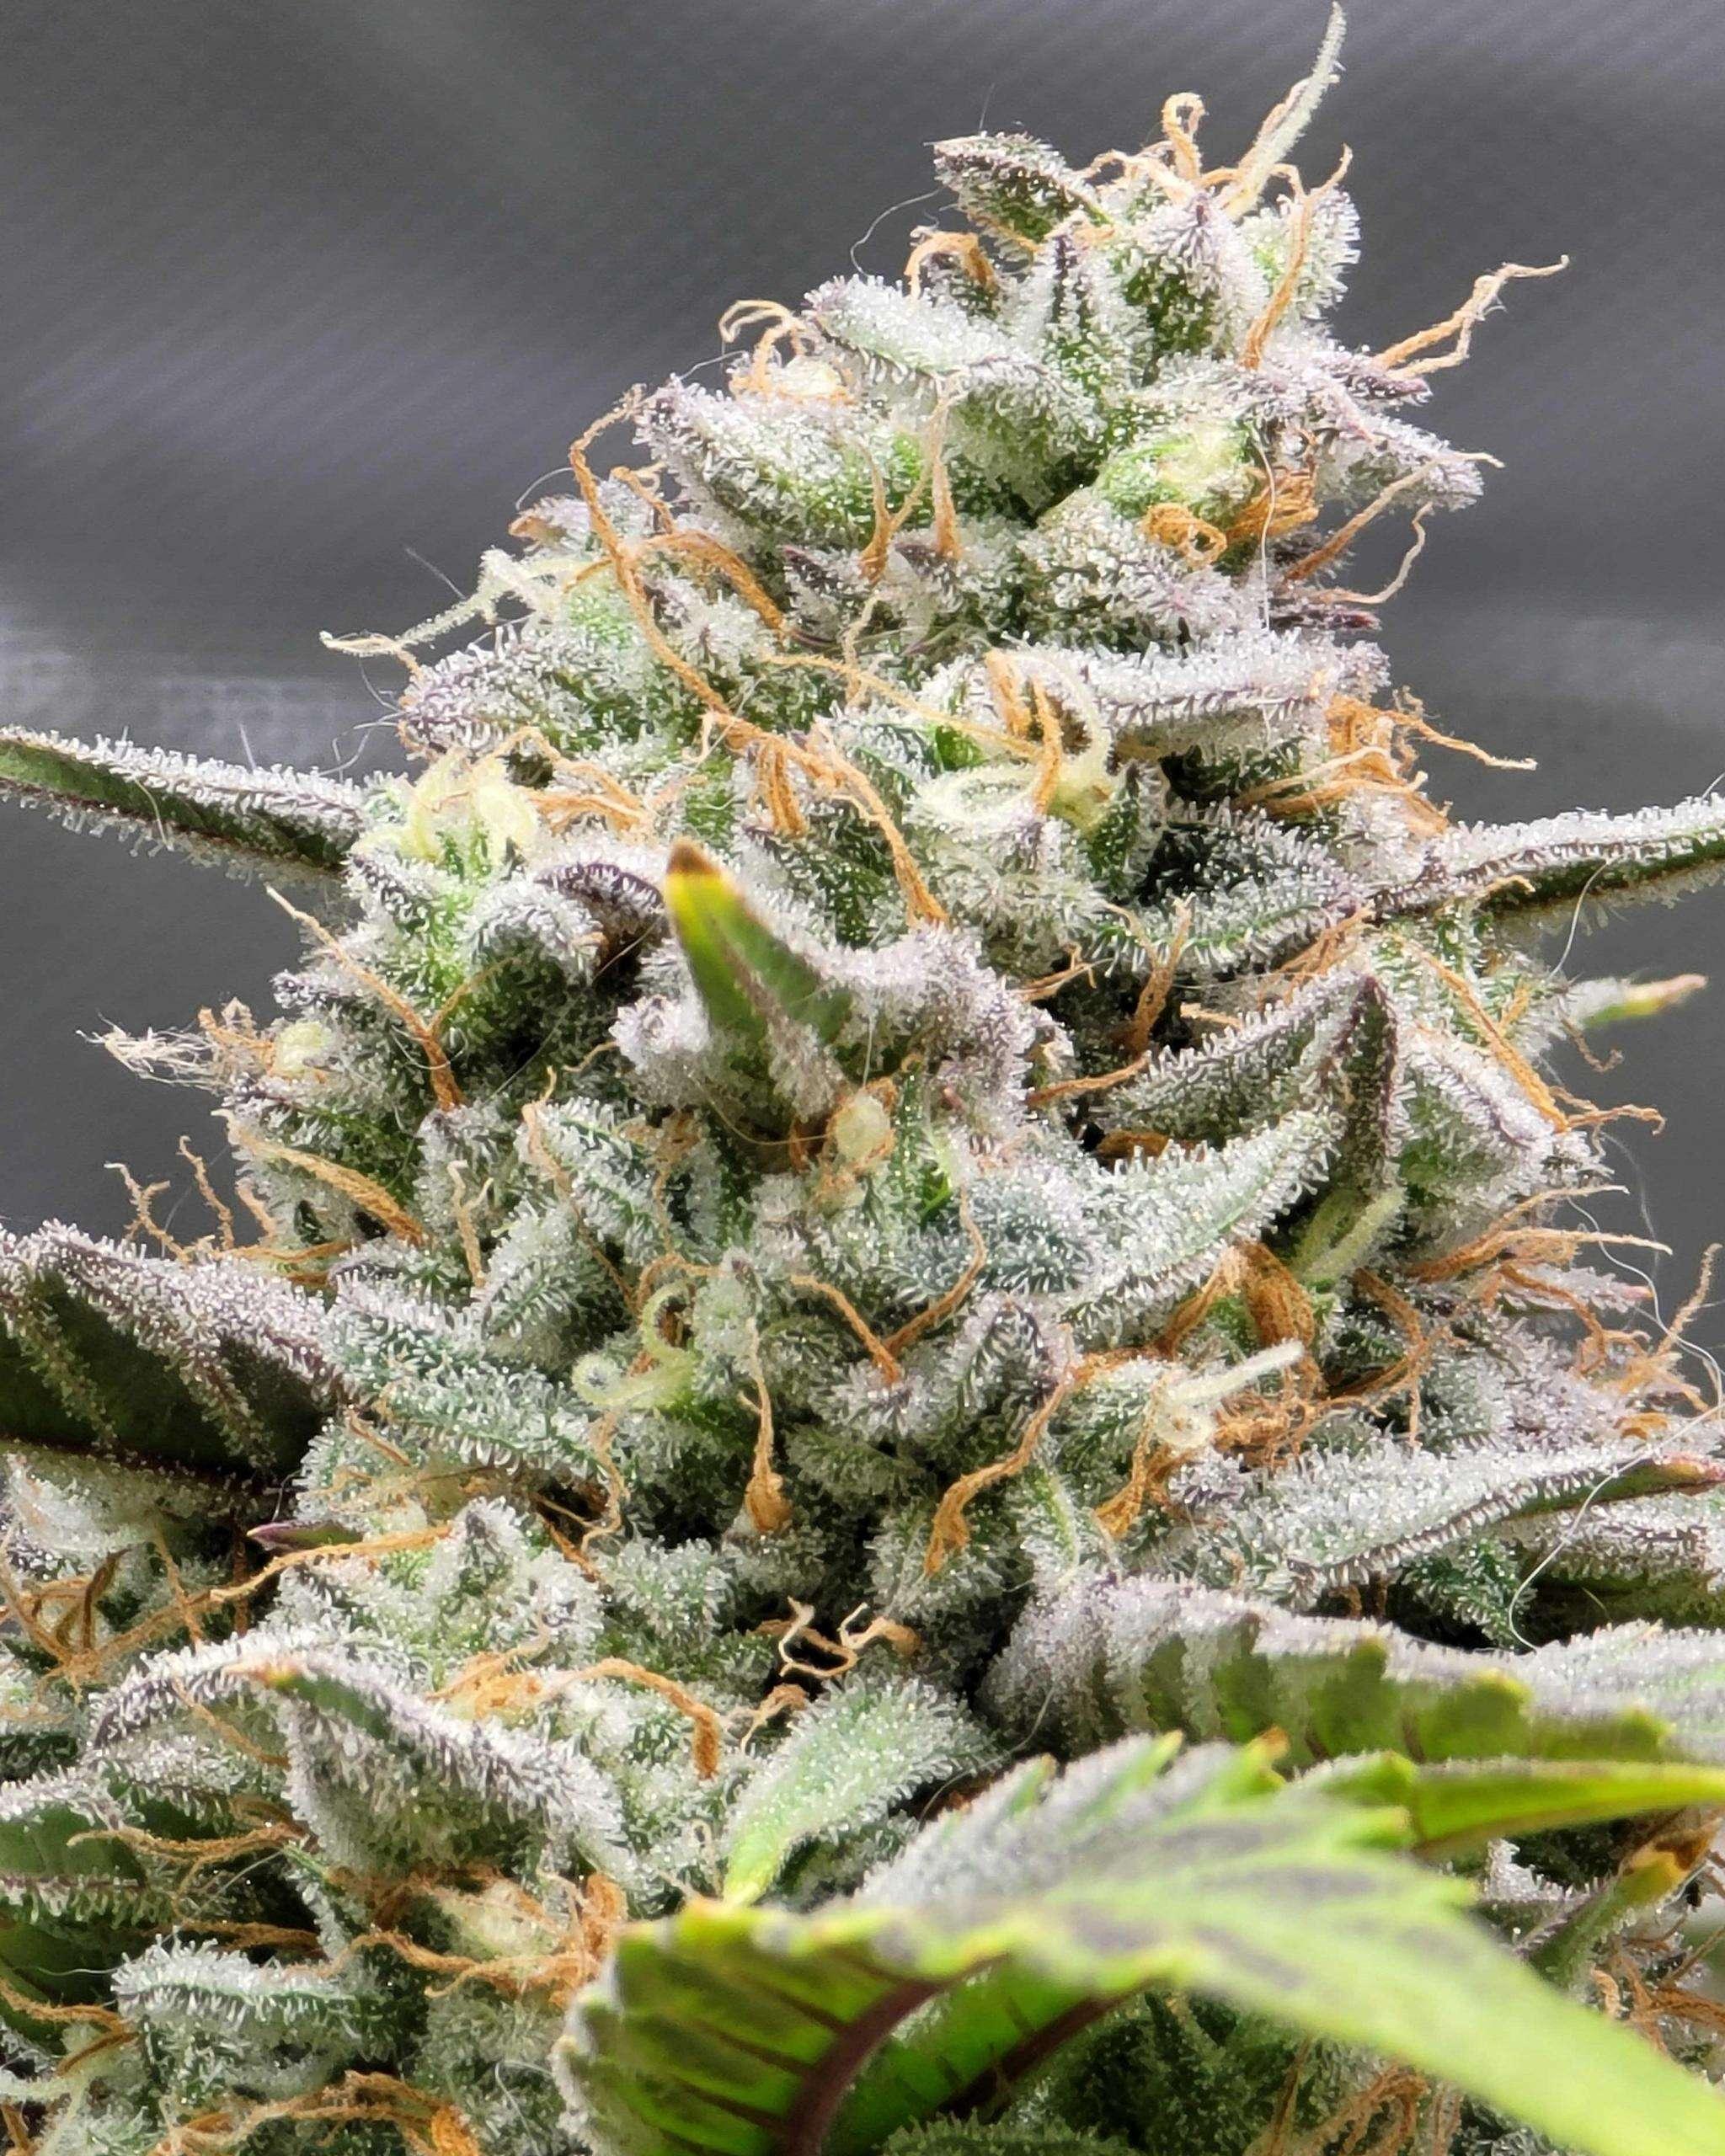 Coco for Cannabis Photo of the Week, 3 bears OG x Double Grape